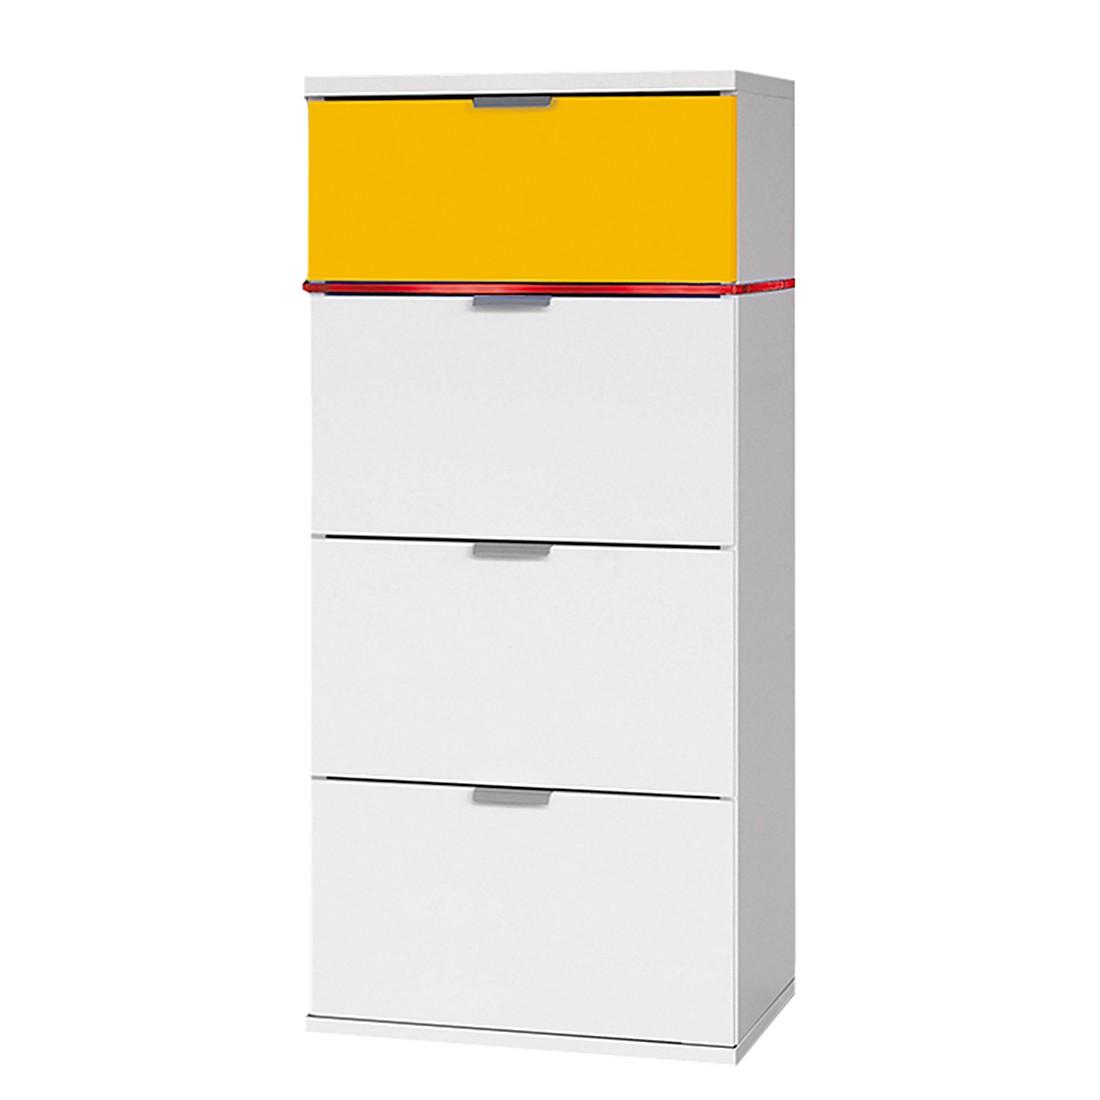 Kommode ColourSleep II - Polarweiß/Gelb (Ohne Beleuchtung)